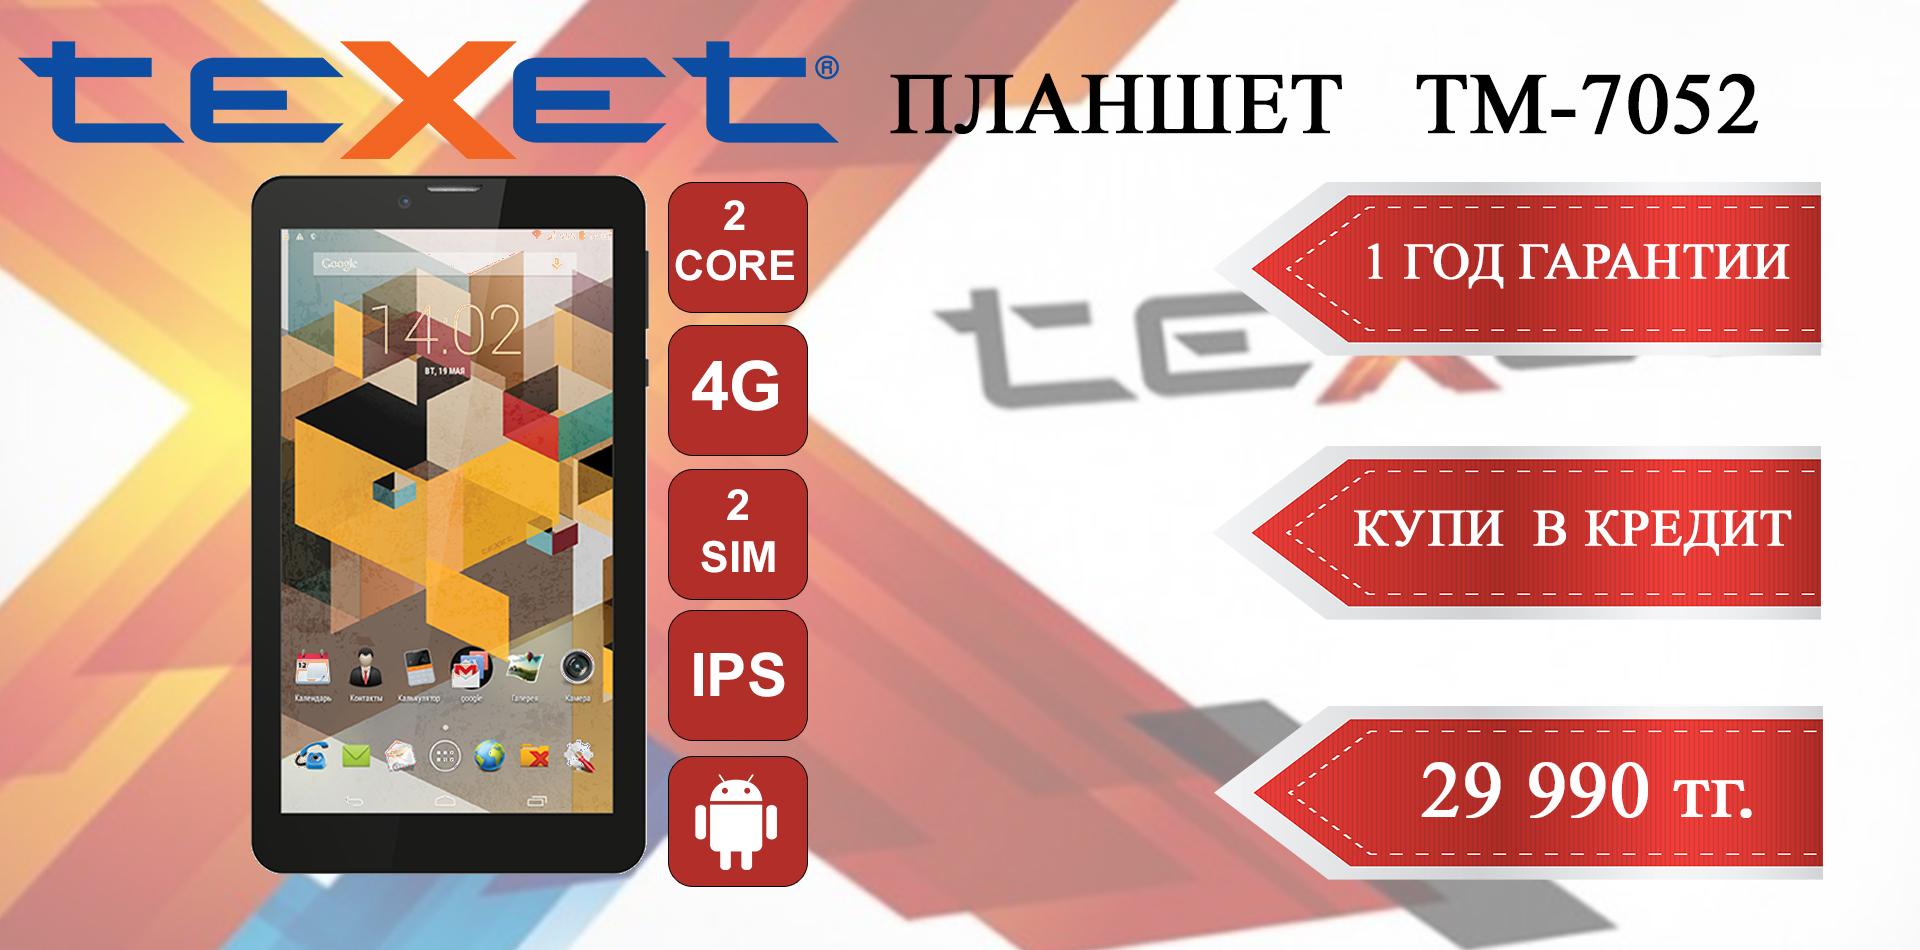 Texet tm-7052